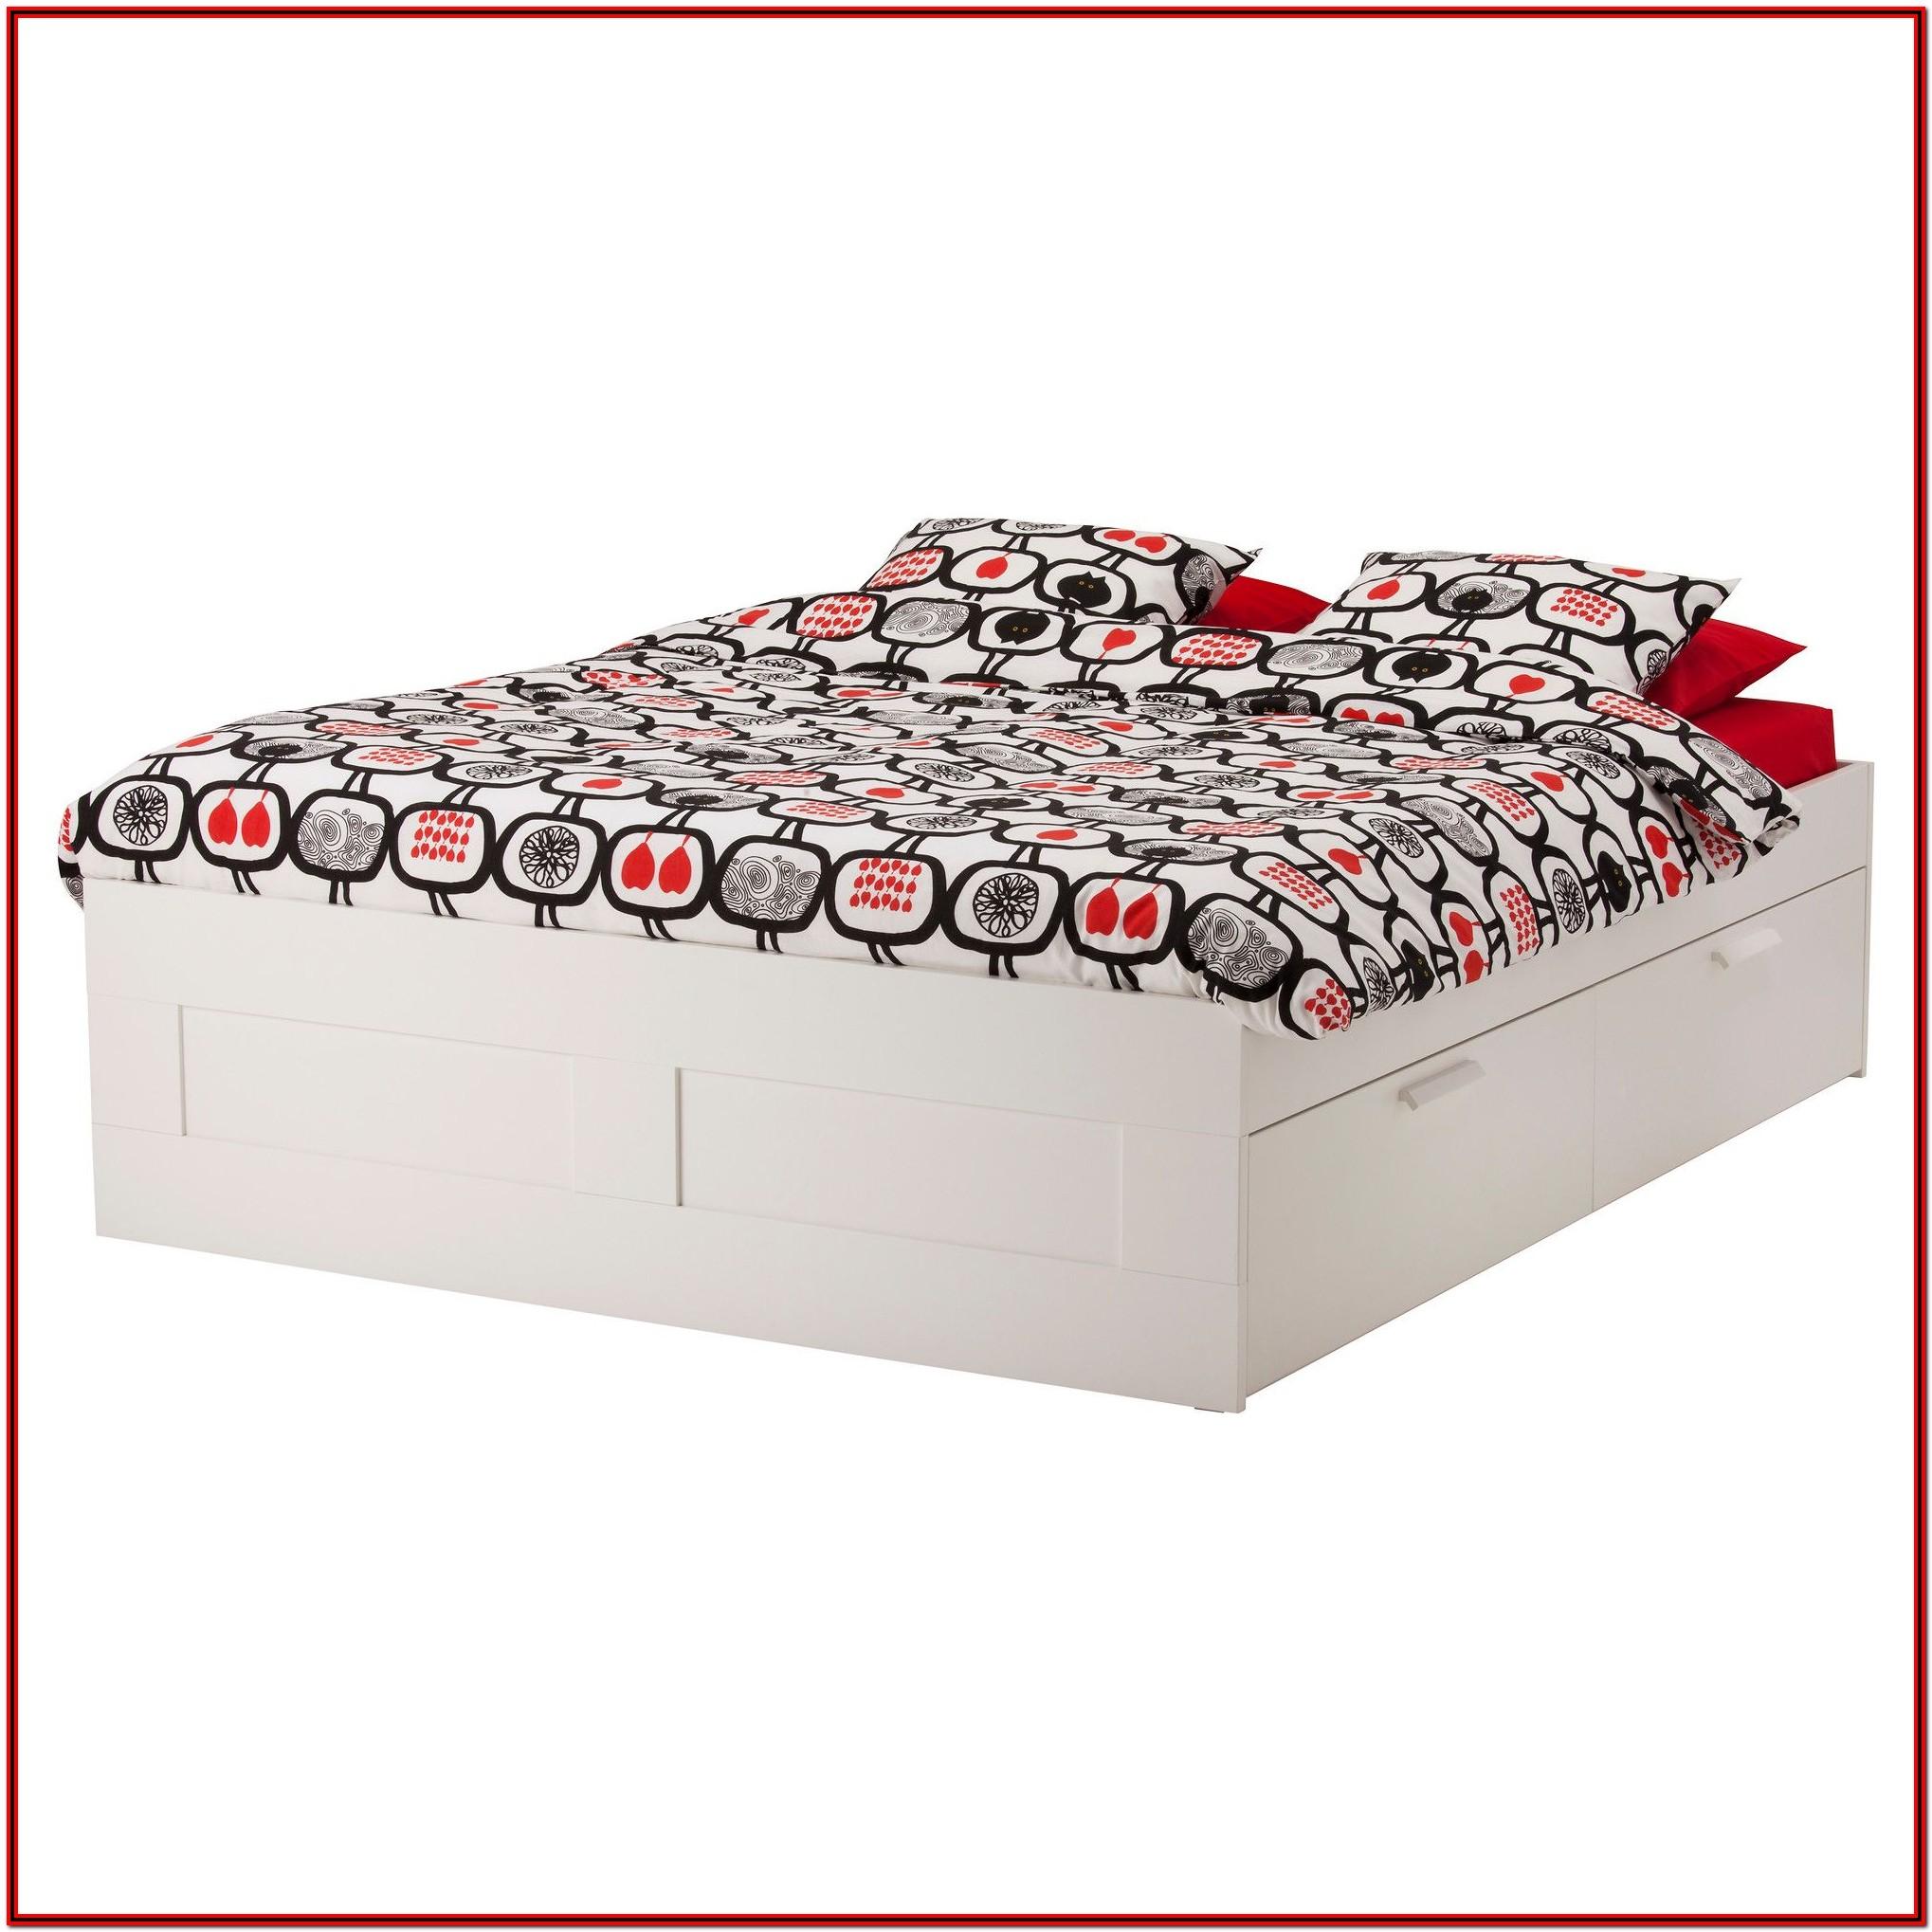 Brimnes Bed Frame With Storage & Headboard